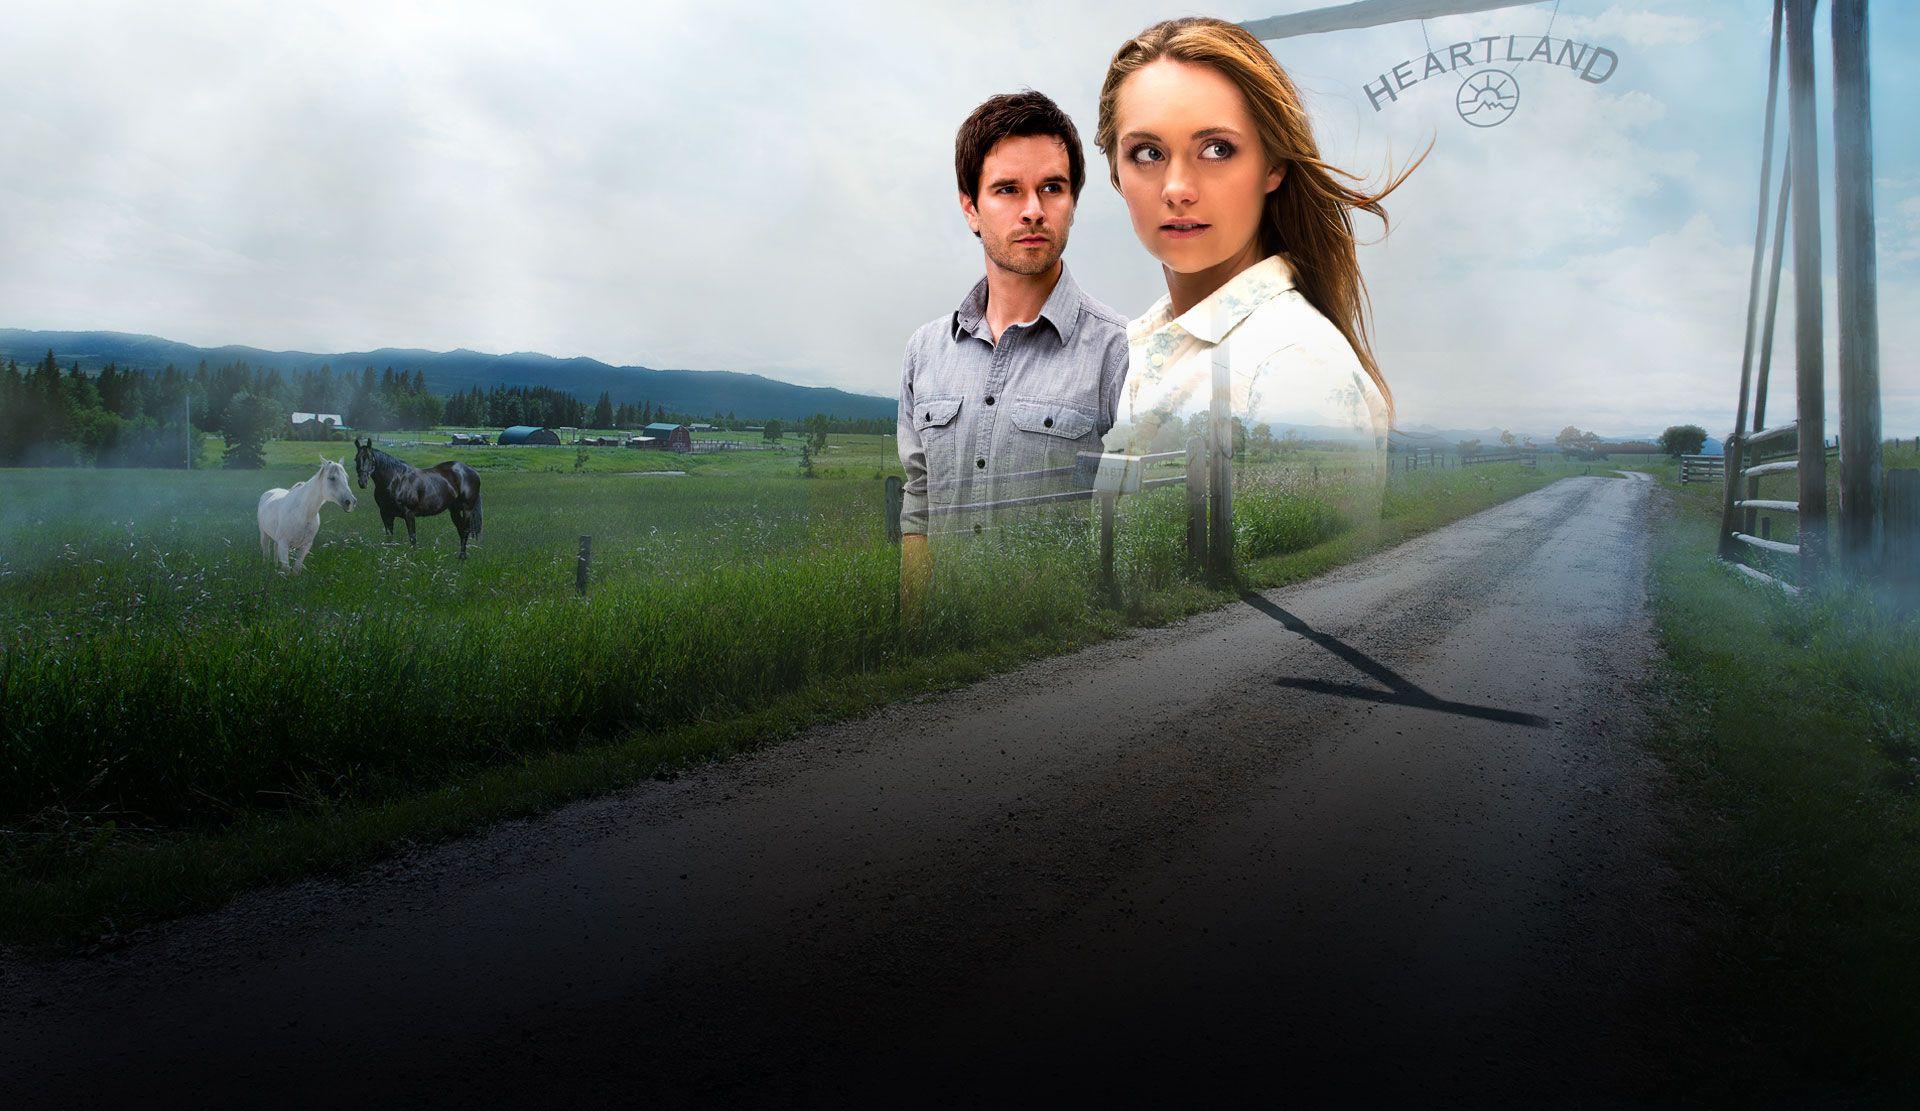 heartland season 7 - Video Search Engine at Search.com